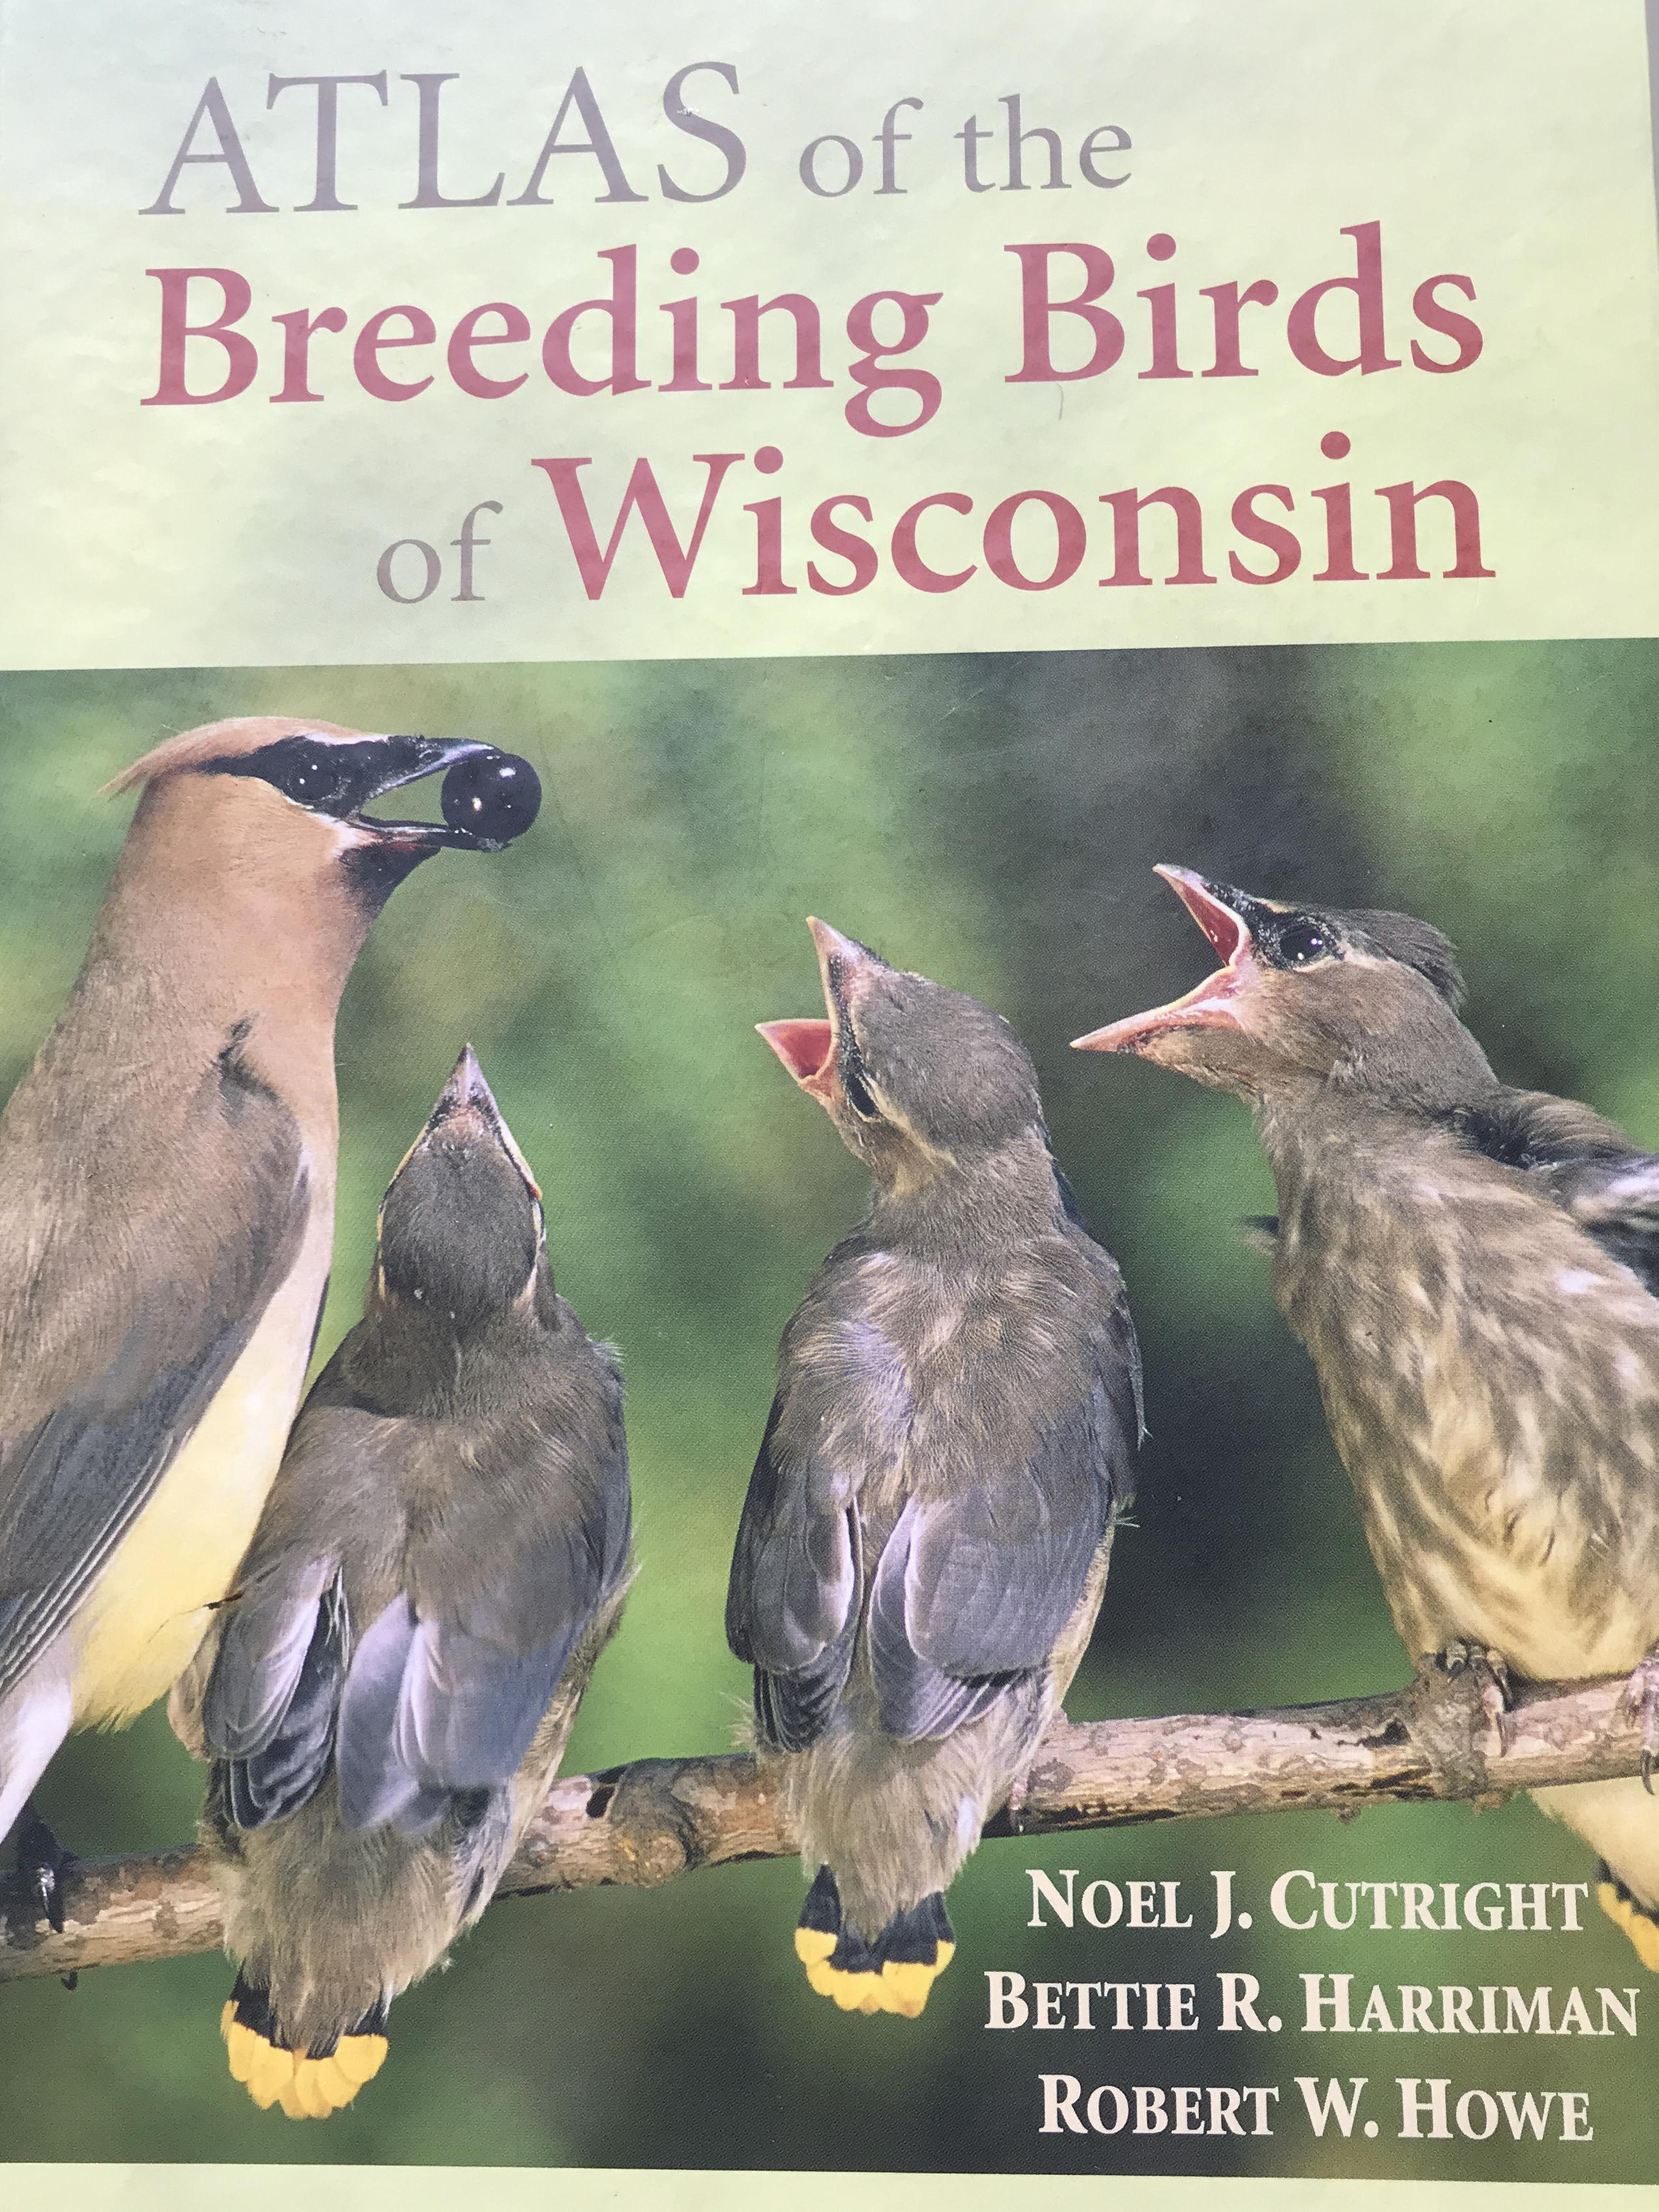 Atlas of the Breeding Birds of Wisconsin